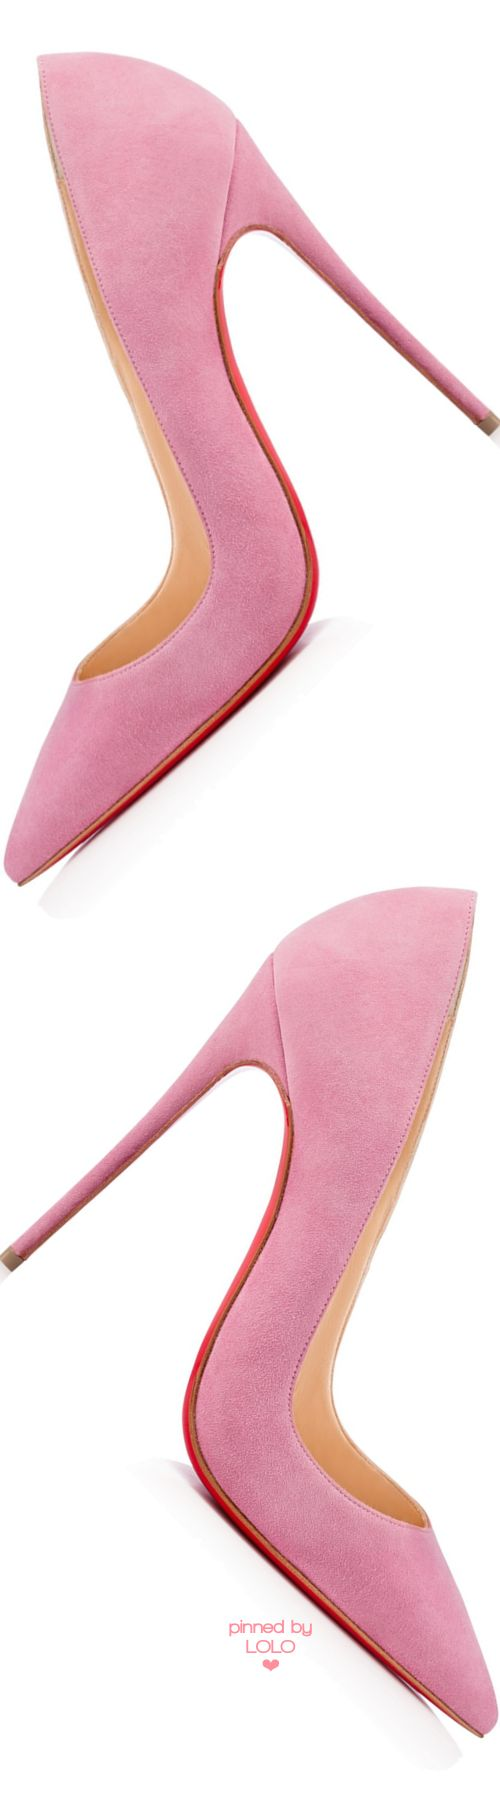 Christian Louboutin ~ 'So Kate' Pink Superfine Stiletto Heels 2015